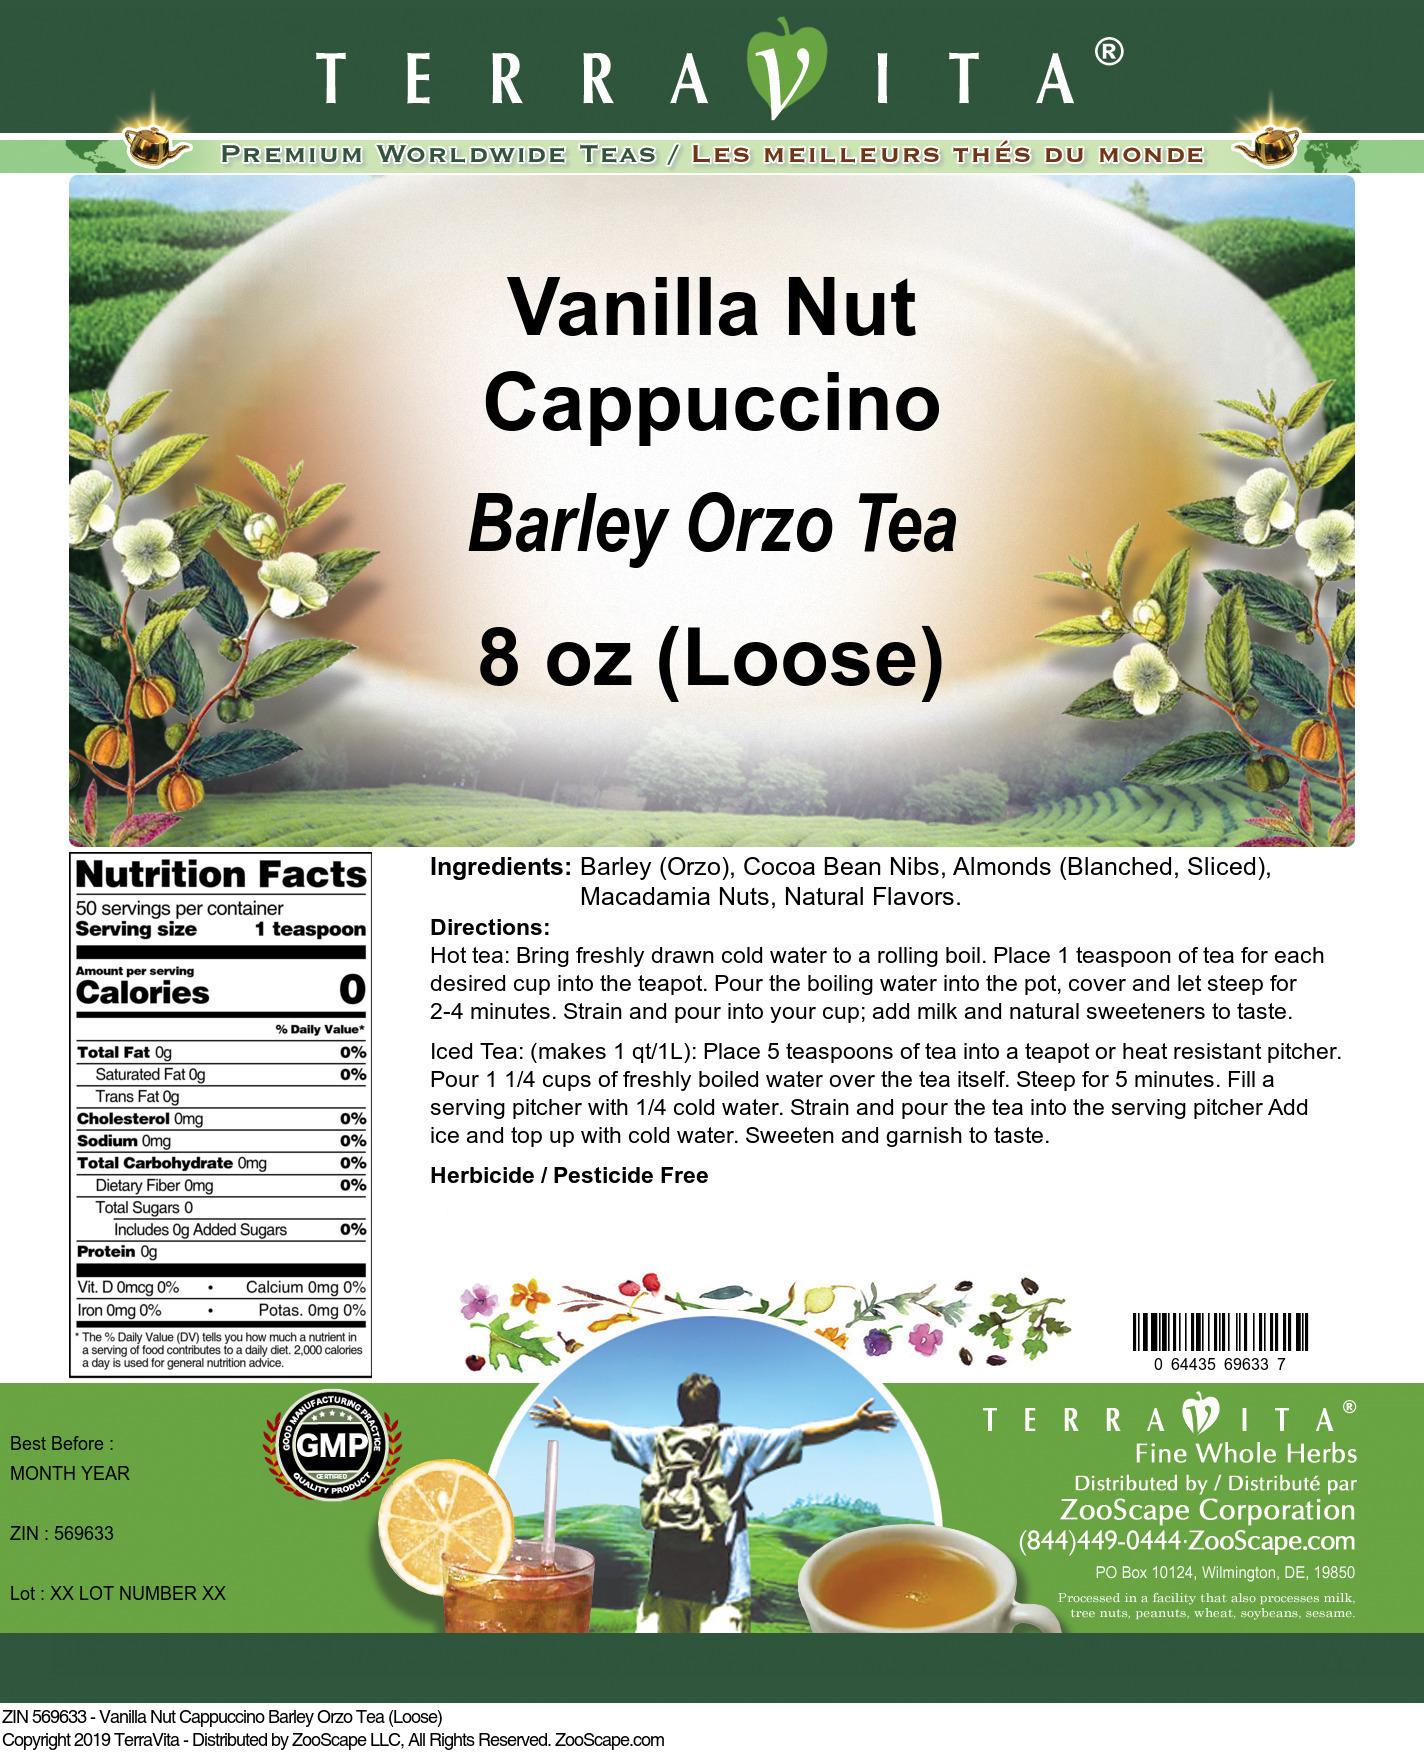 Vanilla Nut Cappuccino Barley Orzo Tea (Loose)